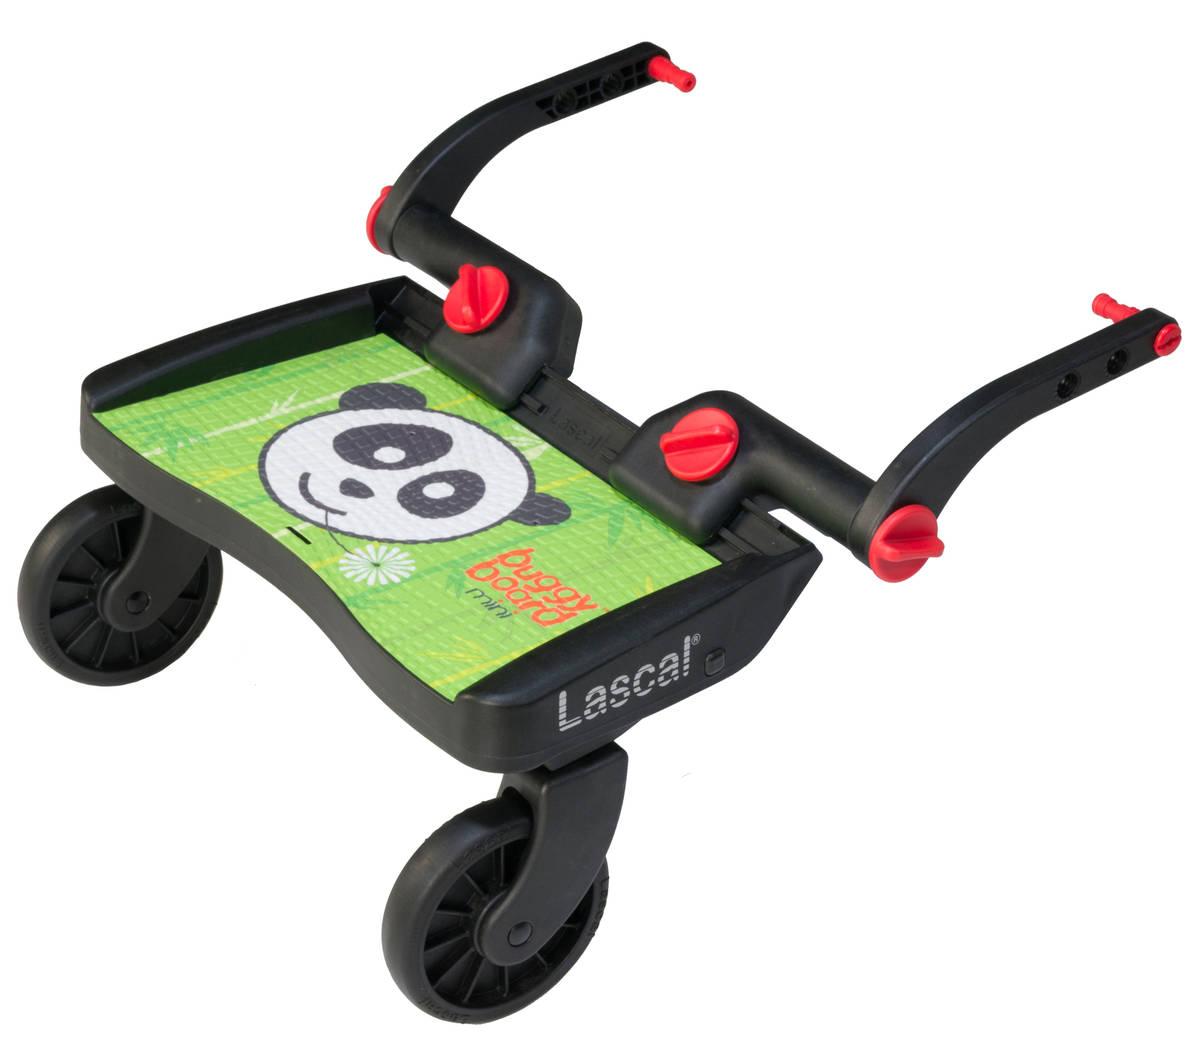 lascal buggy board mini seisomalauta panda a t lastenturva verkkokauppa. Black Bedroom Furniture Sets. Home Design Ideas